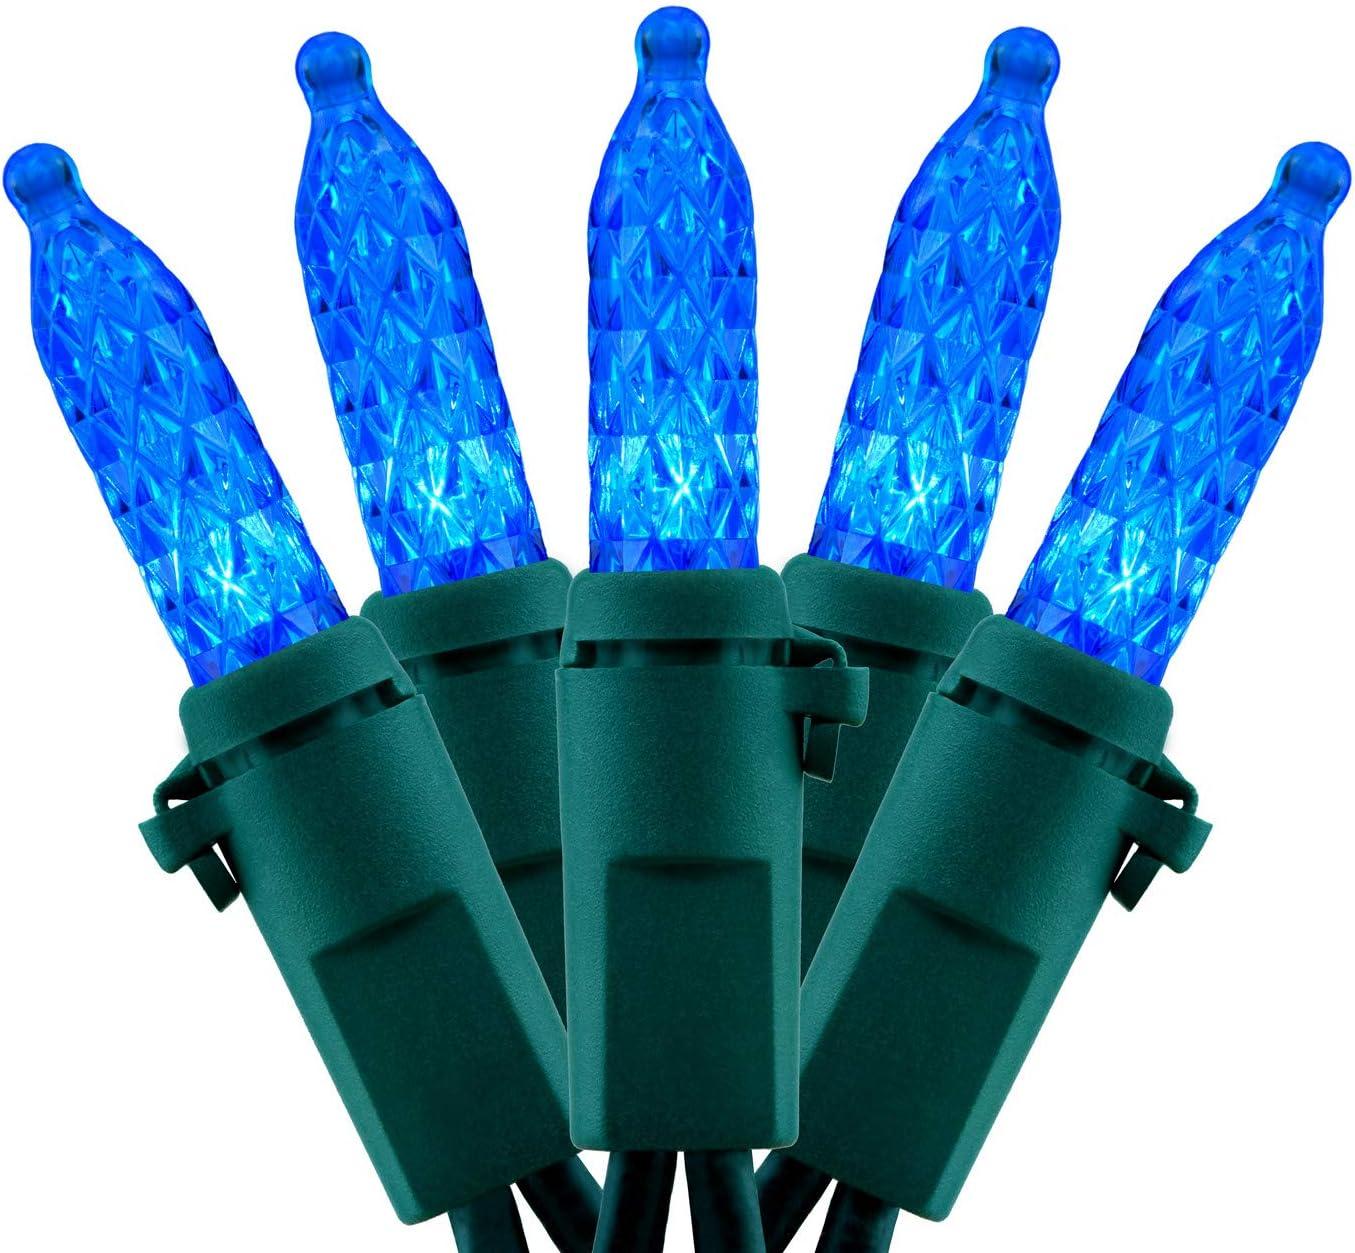 66 Feet 200 Count Blue Faceted LED Christmas String Lights, 2-Strand 33 Ft 100 Lights 4